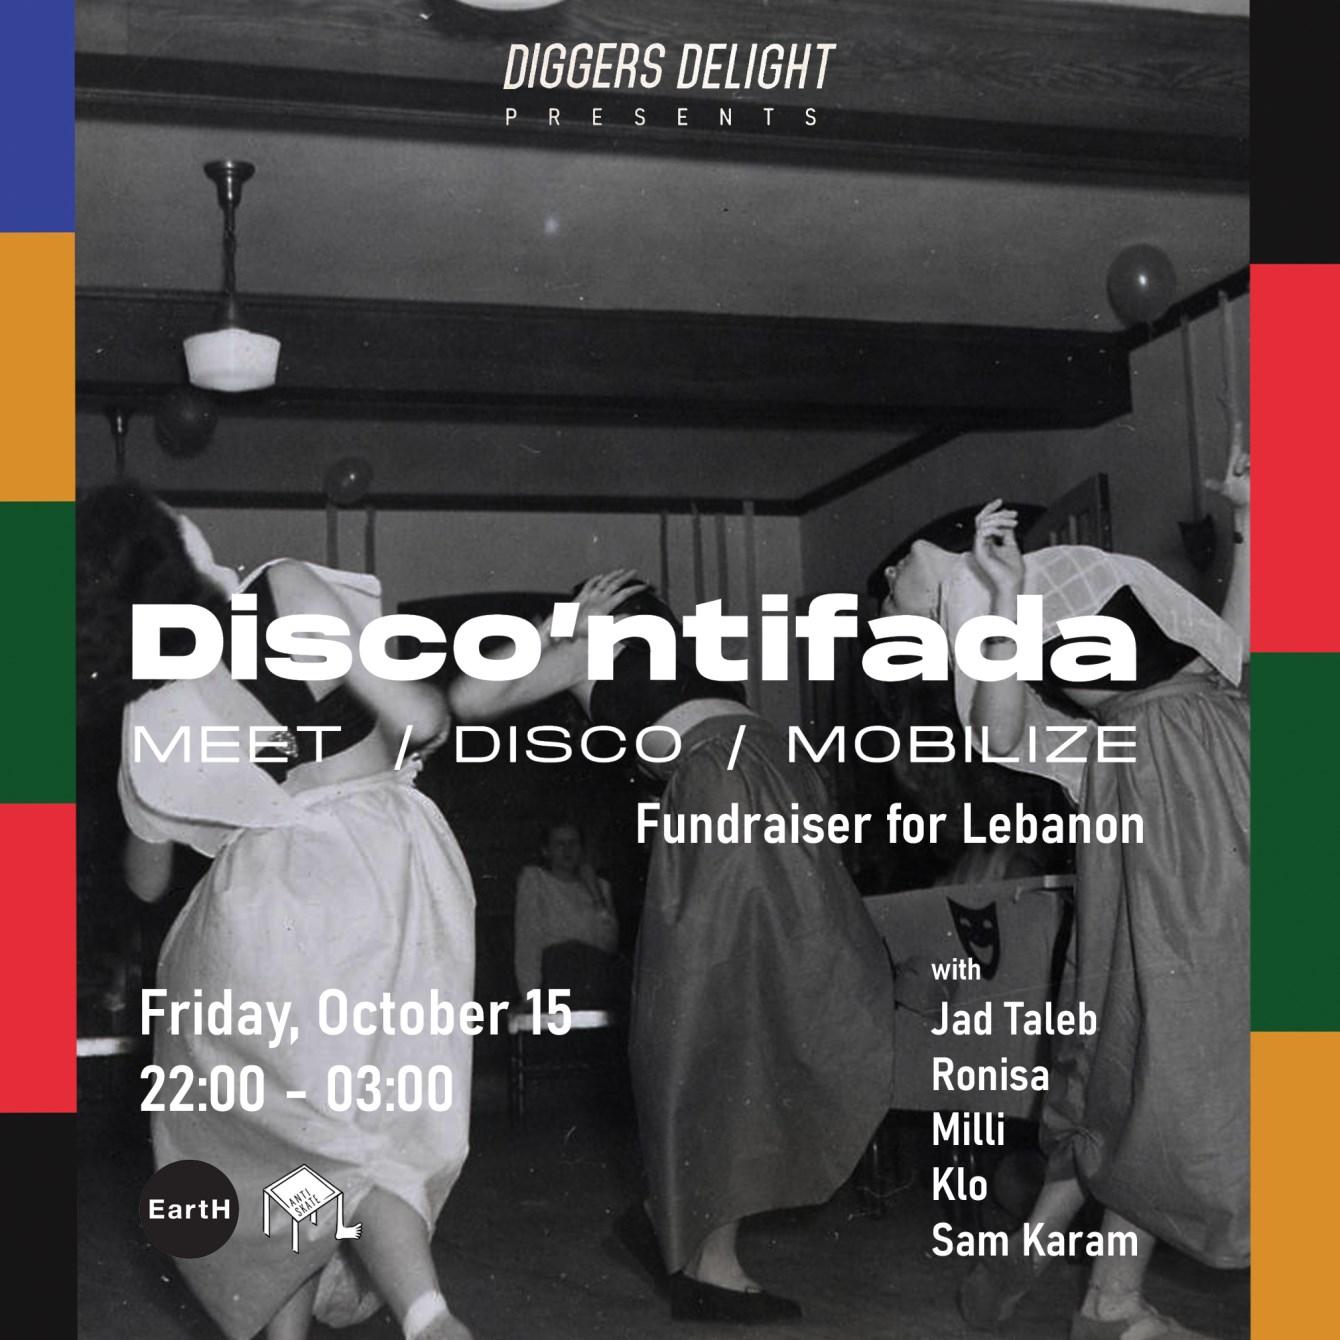 Diggers Delight presents Disco'ntifada (Fundraiser for Lebanon) - Flyer front